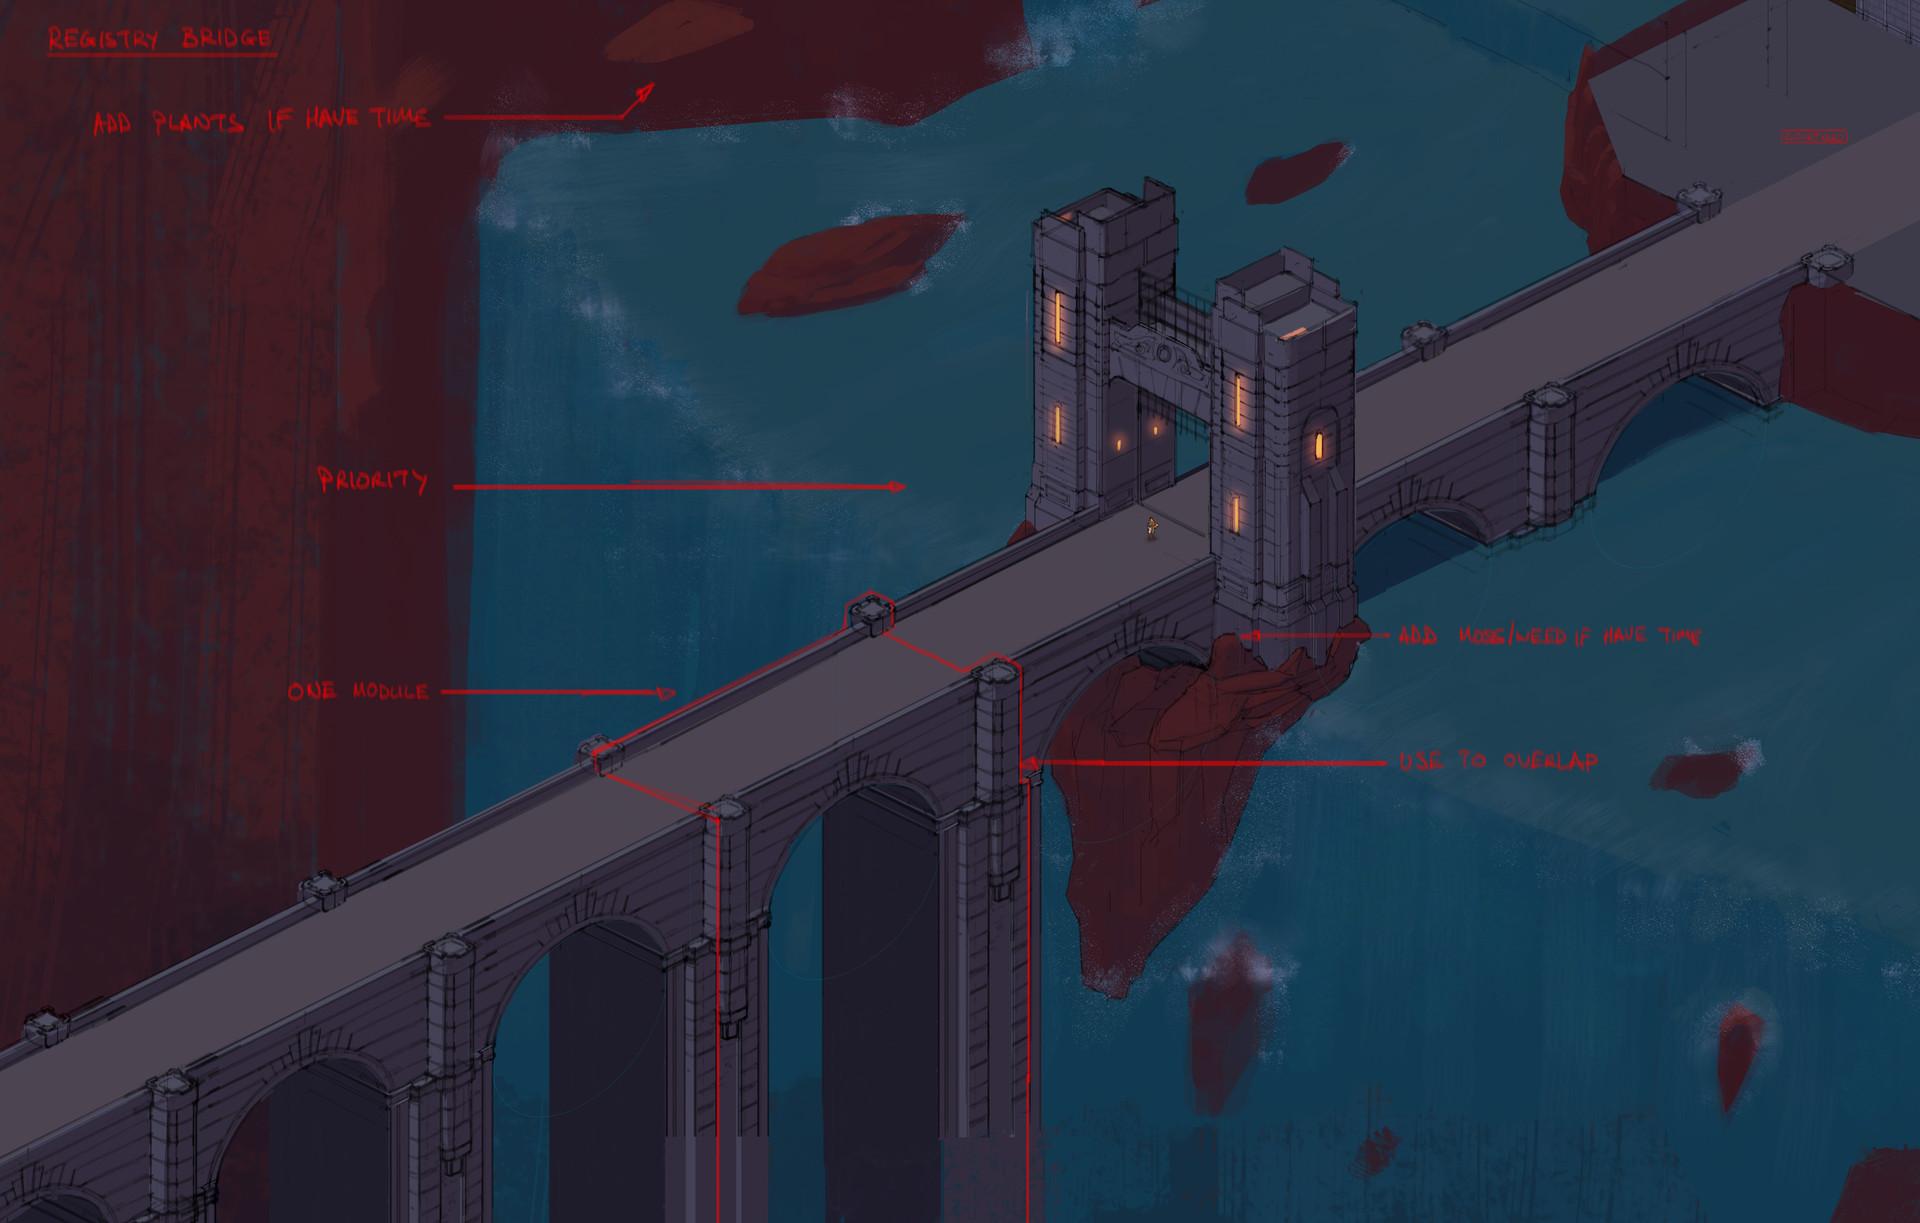 Dominic chan reg bridge concept